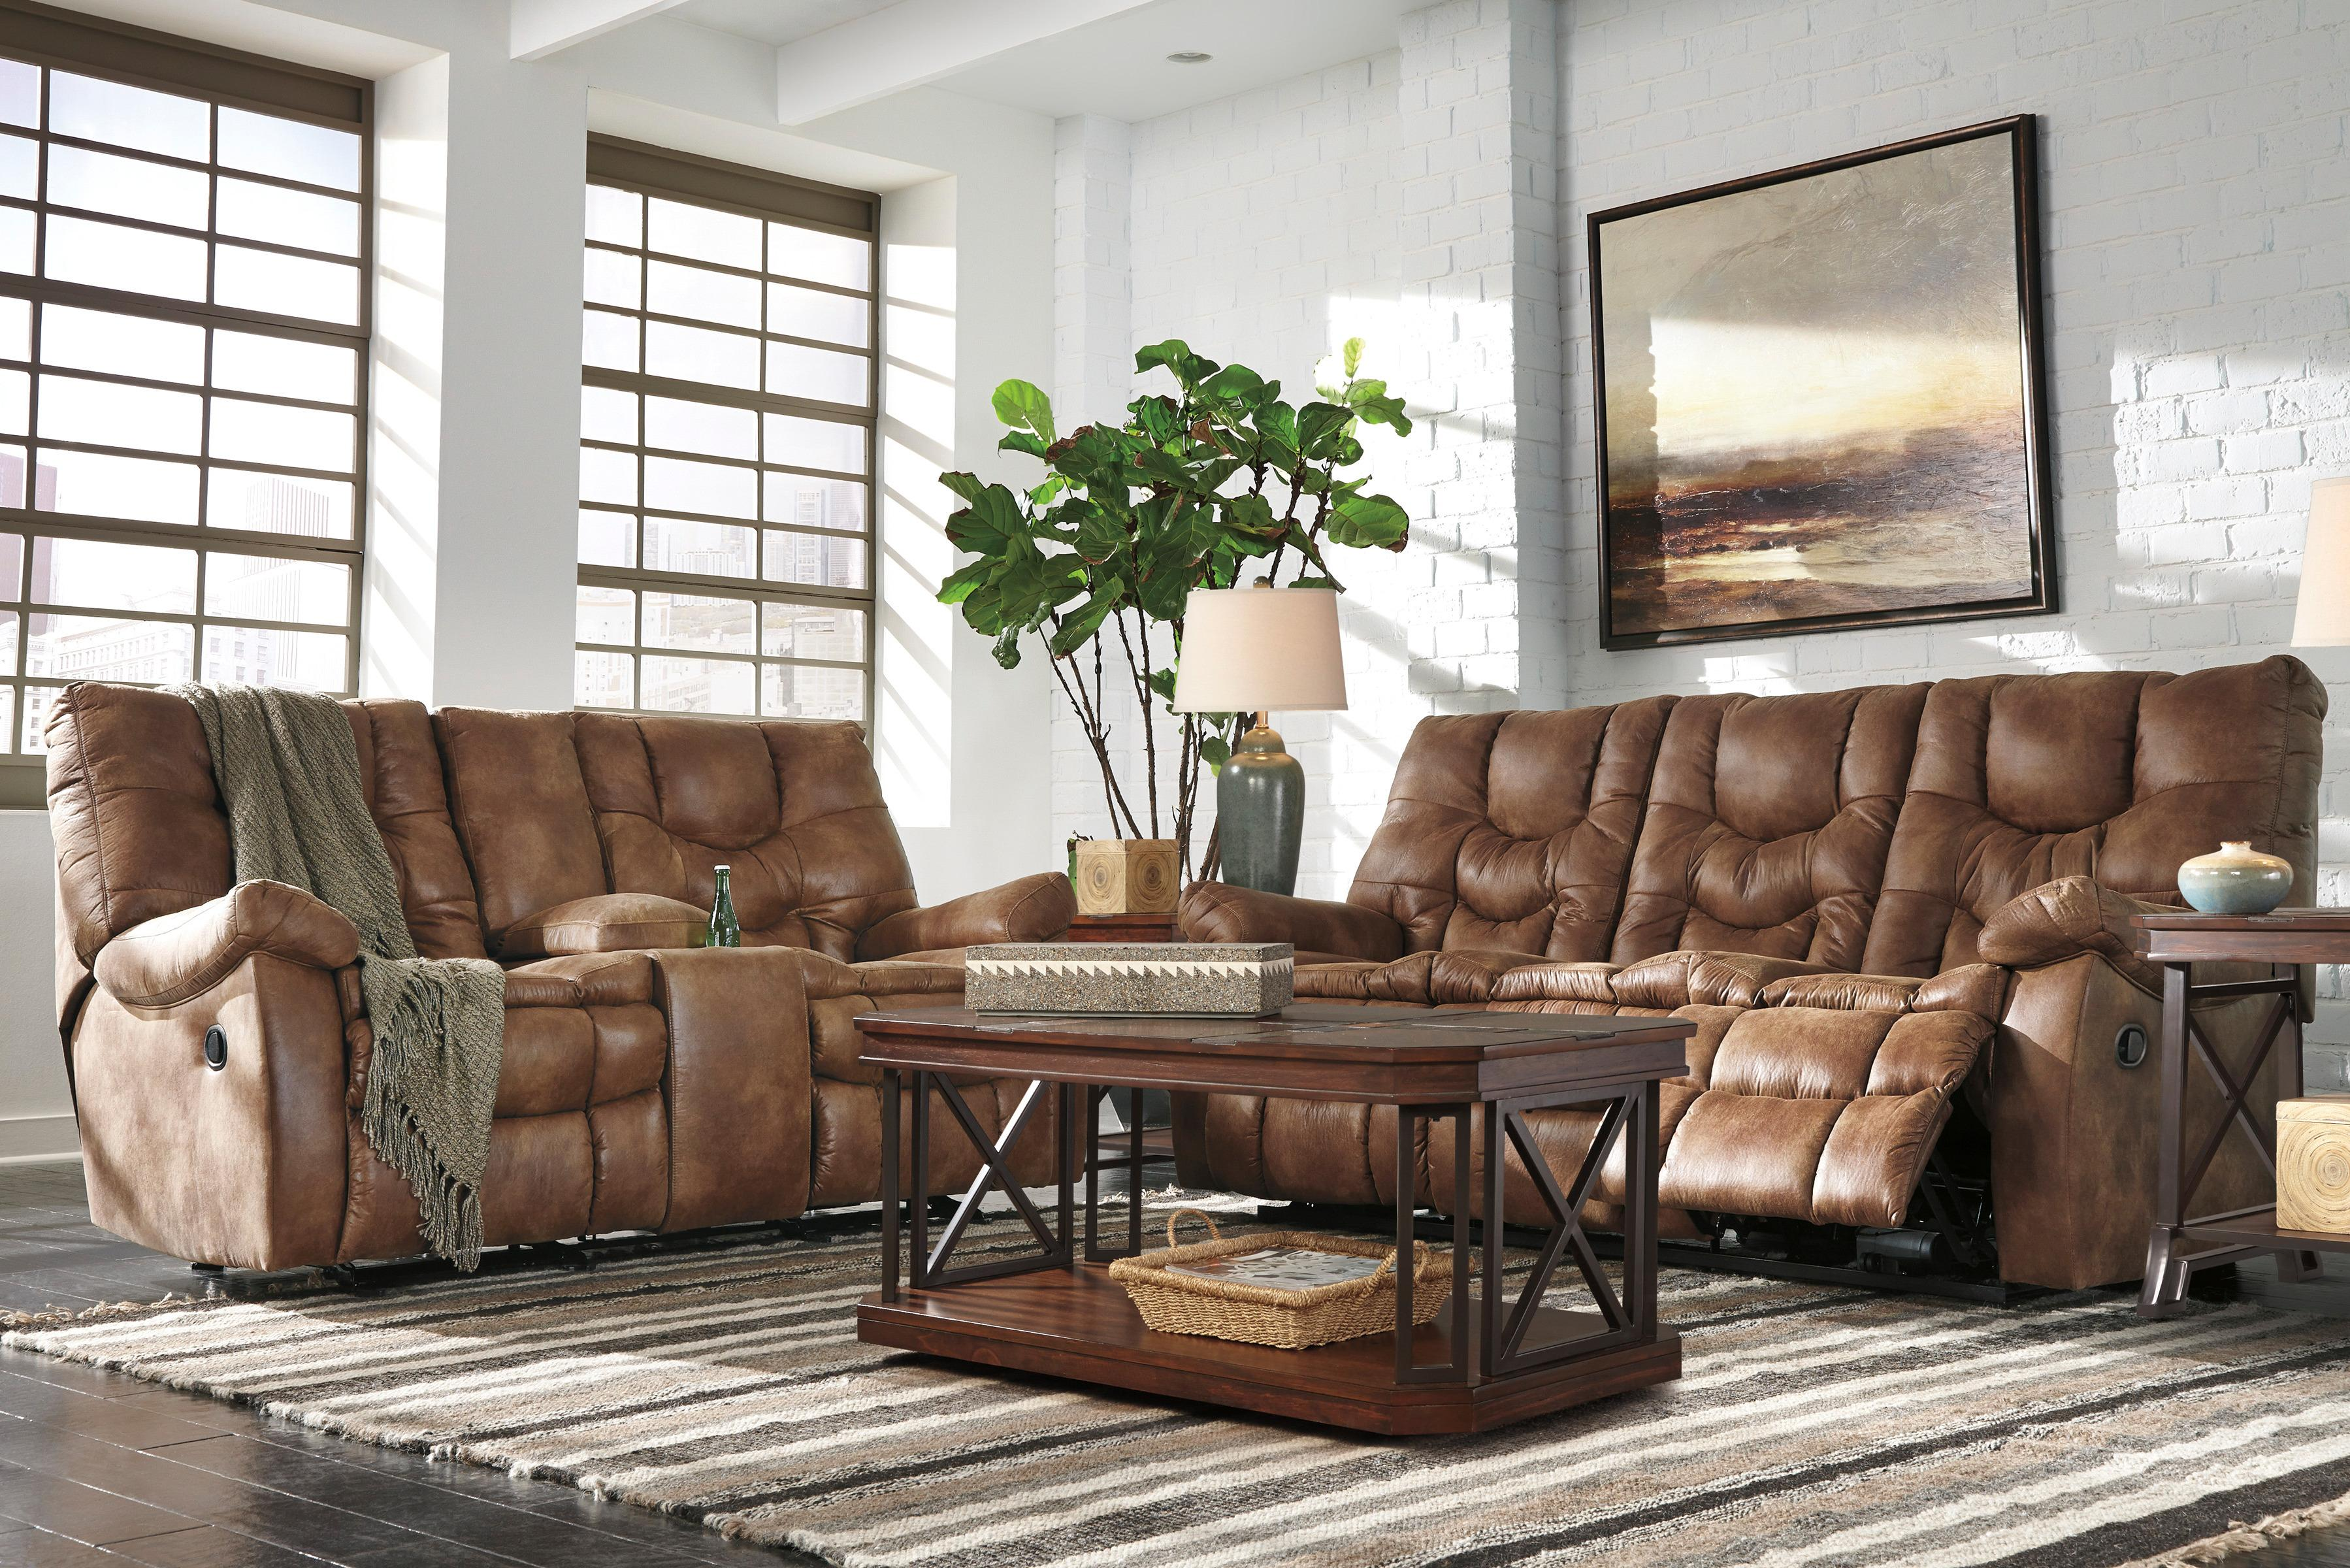 Ashley HomeStore image 5